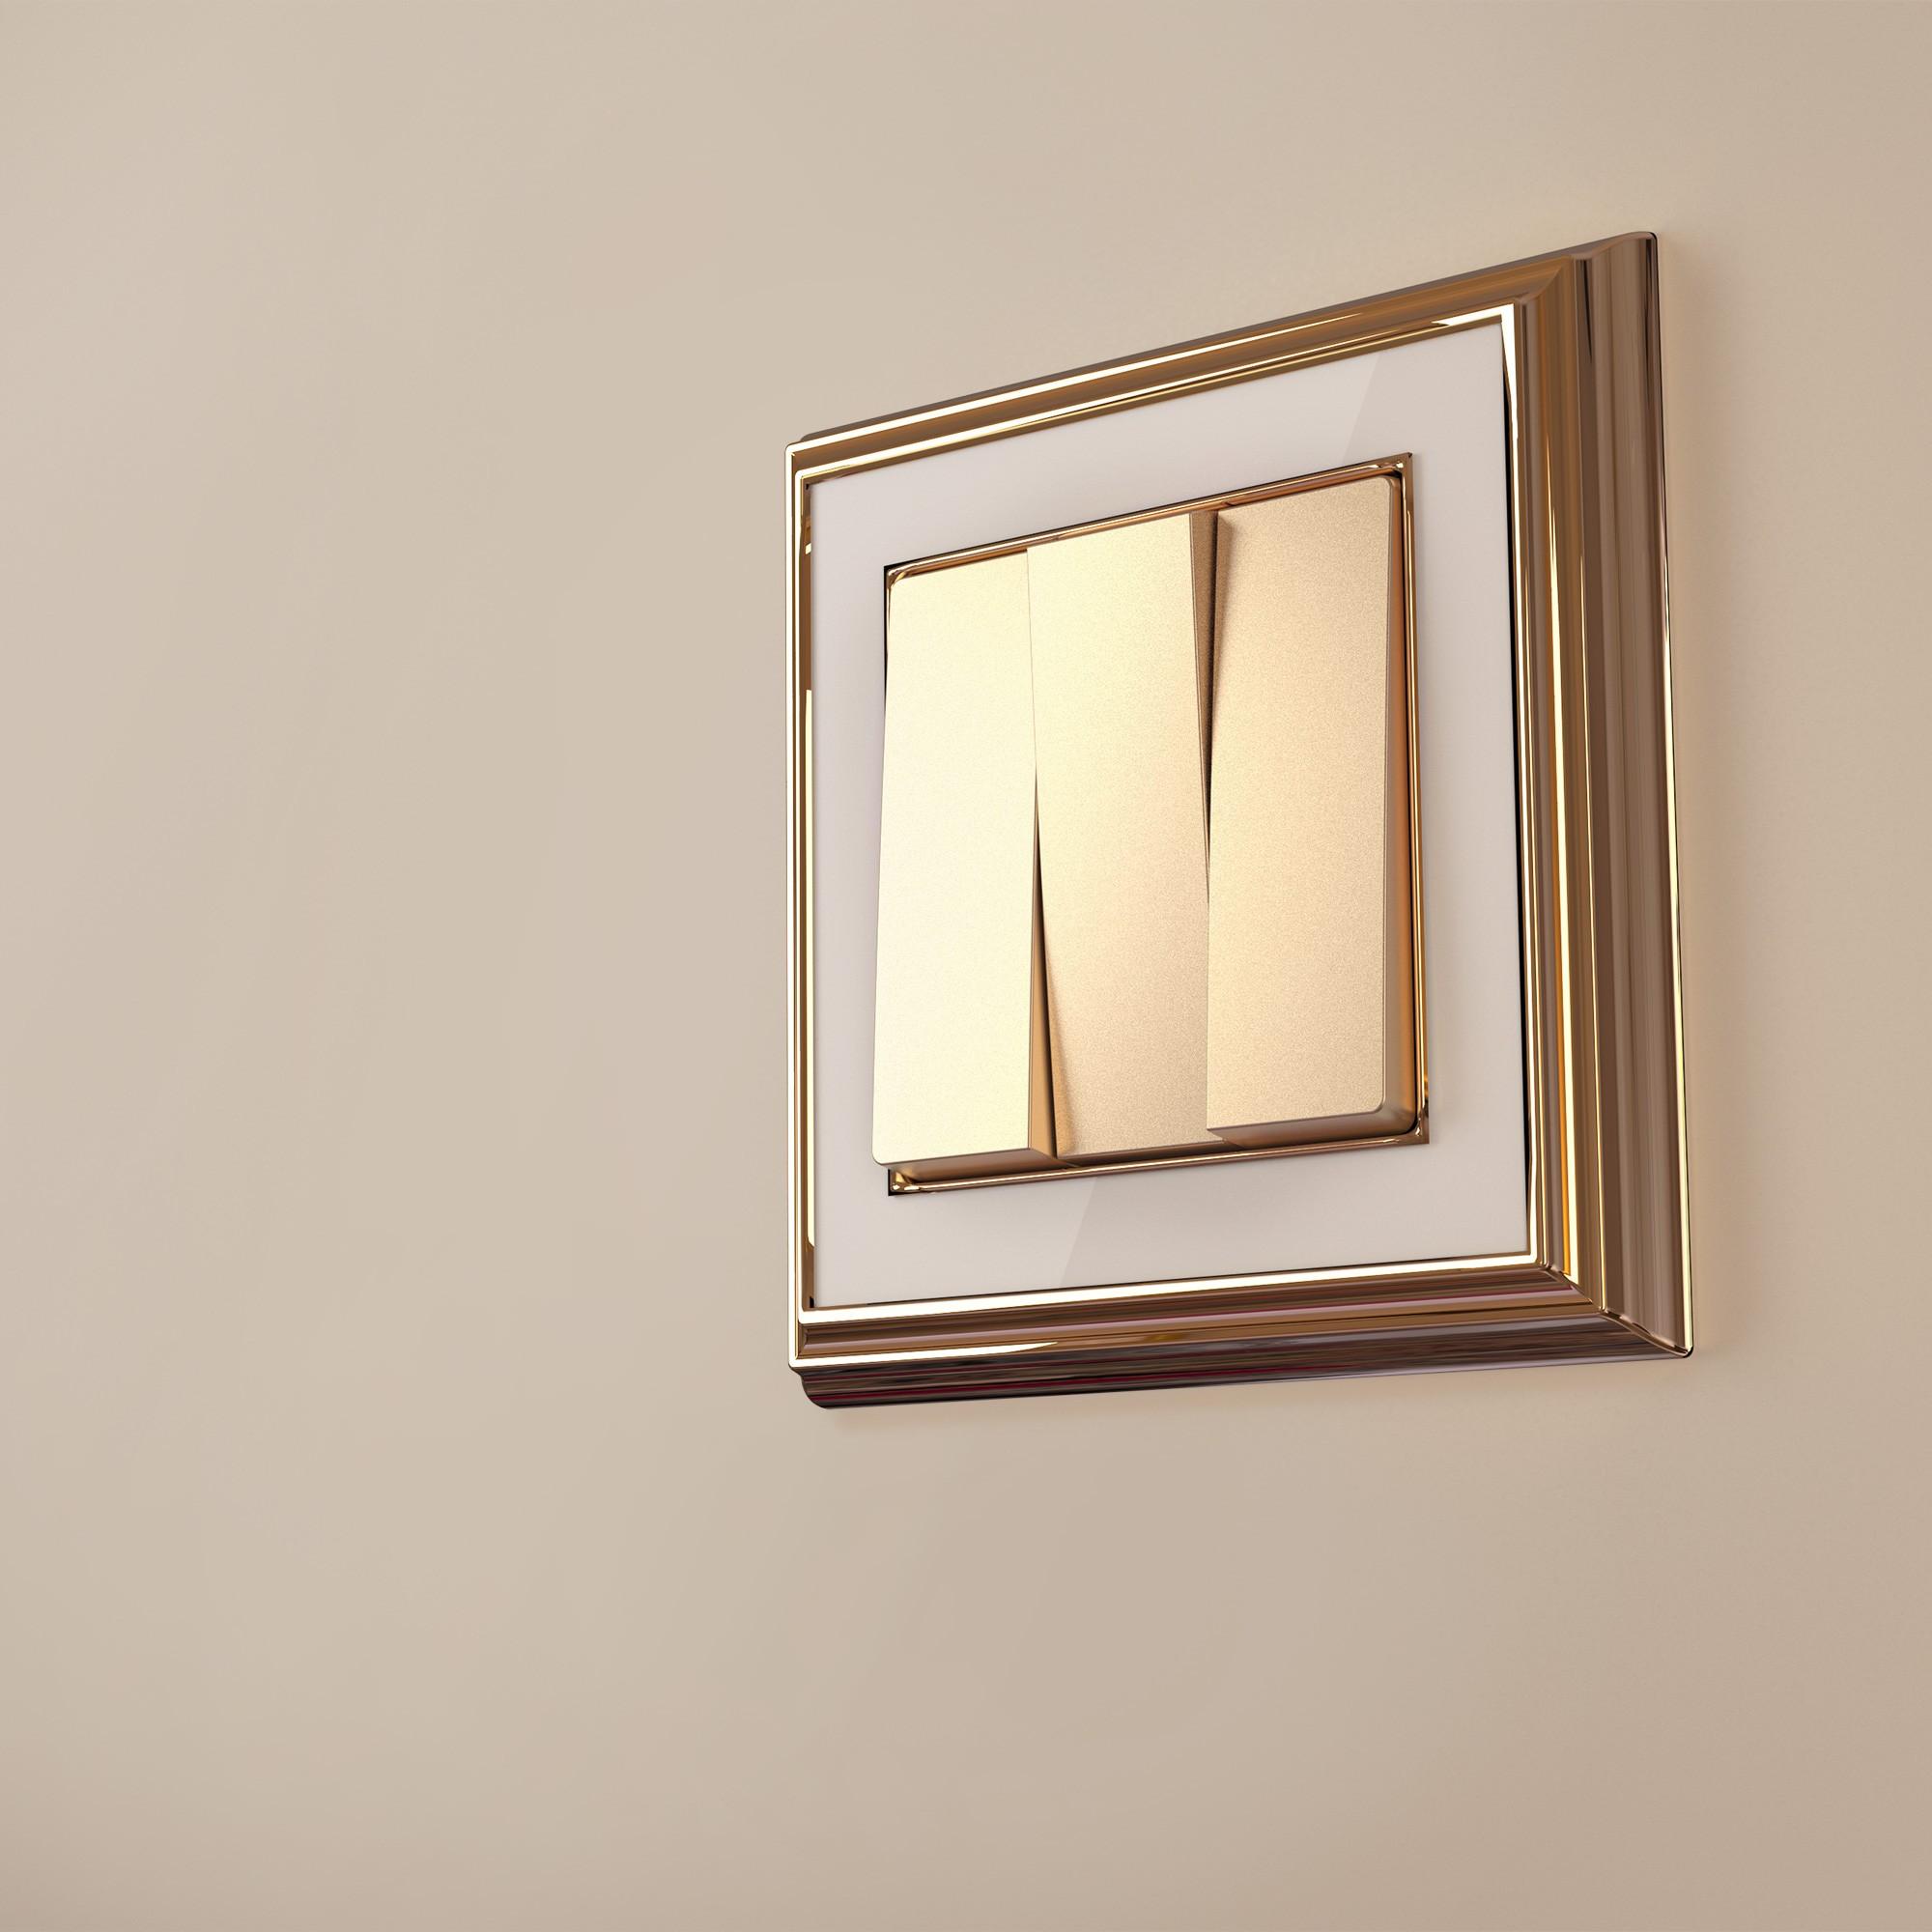 WL17-Frame-01/ Рамка на 1 пост (золото/белый)